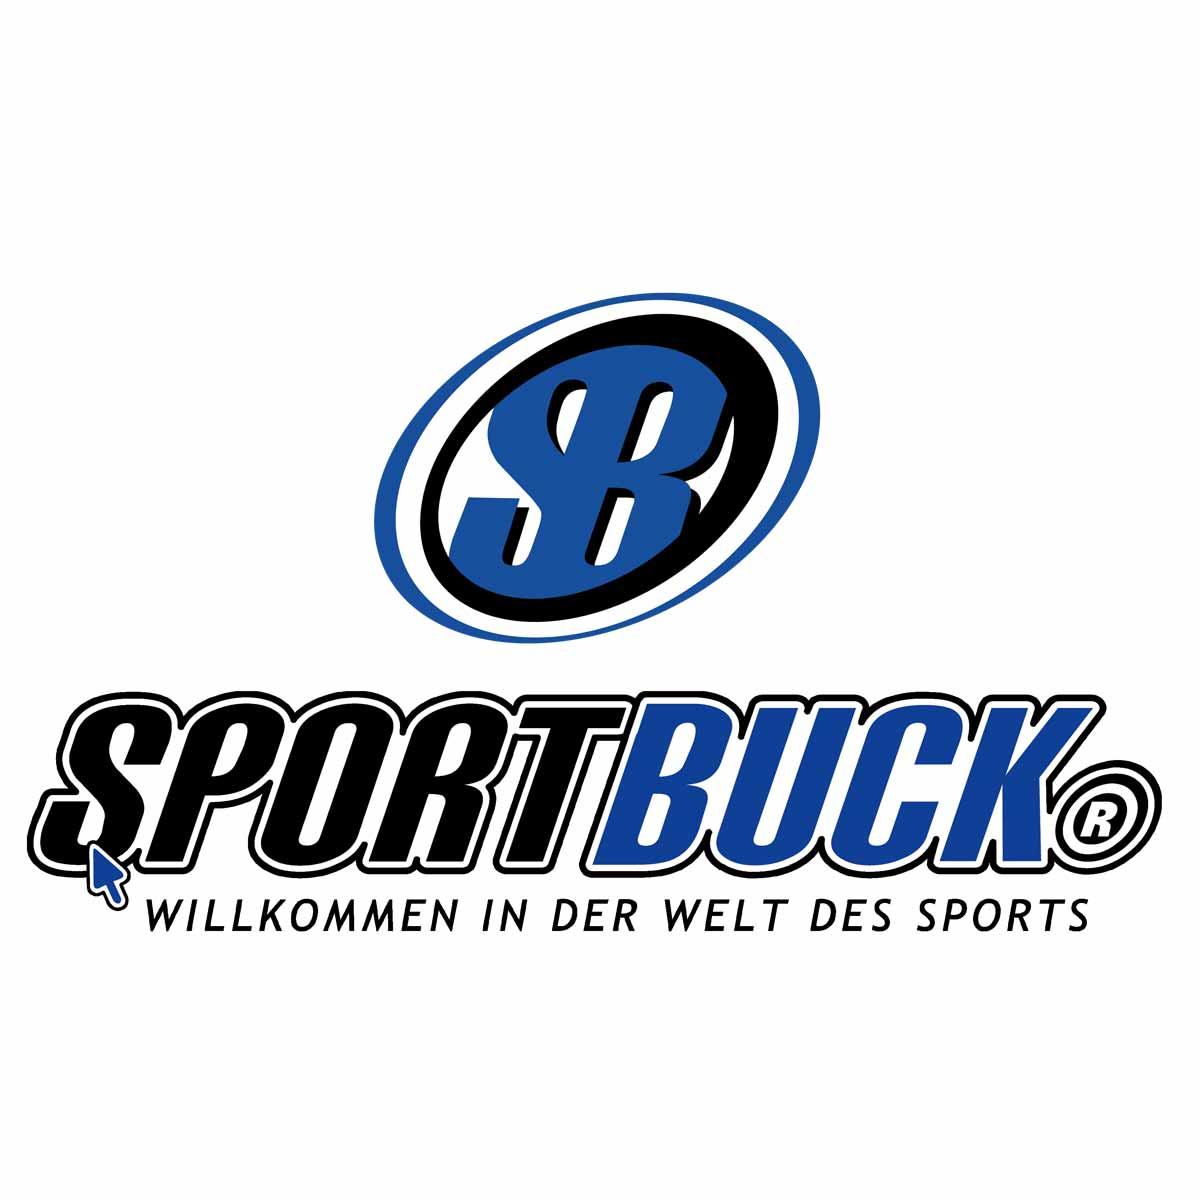 Skimmer Eco Dry 7,1mm Halbseil night 50 m